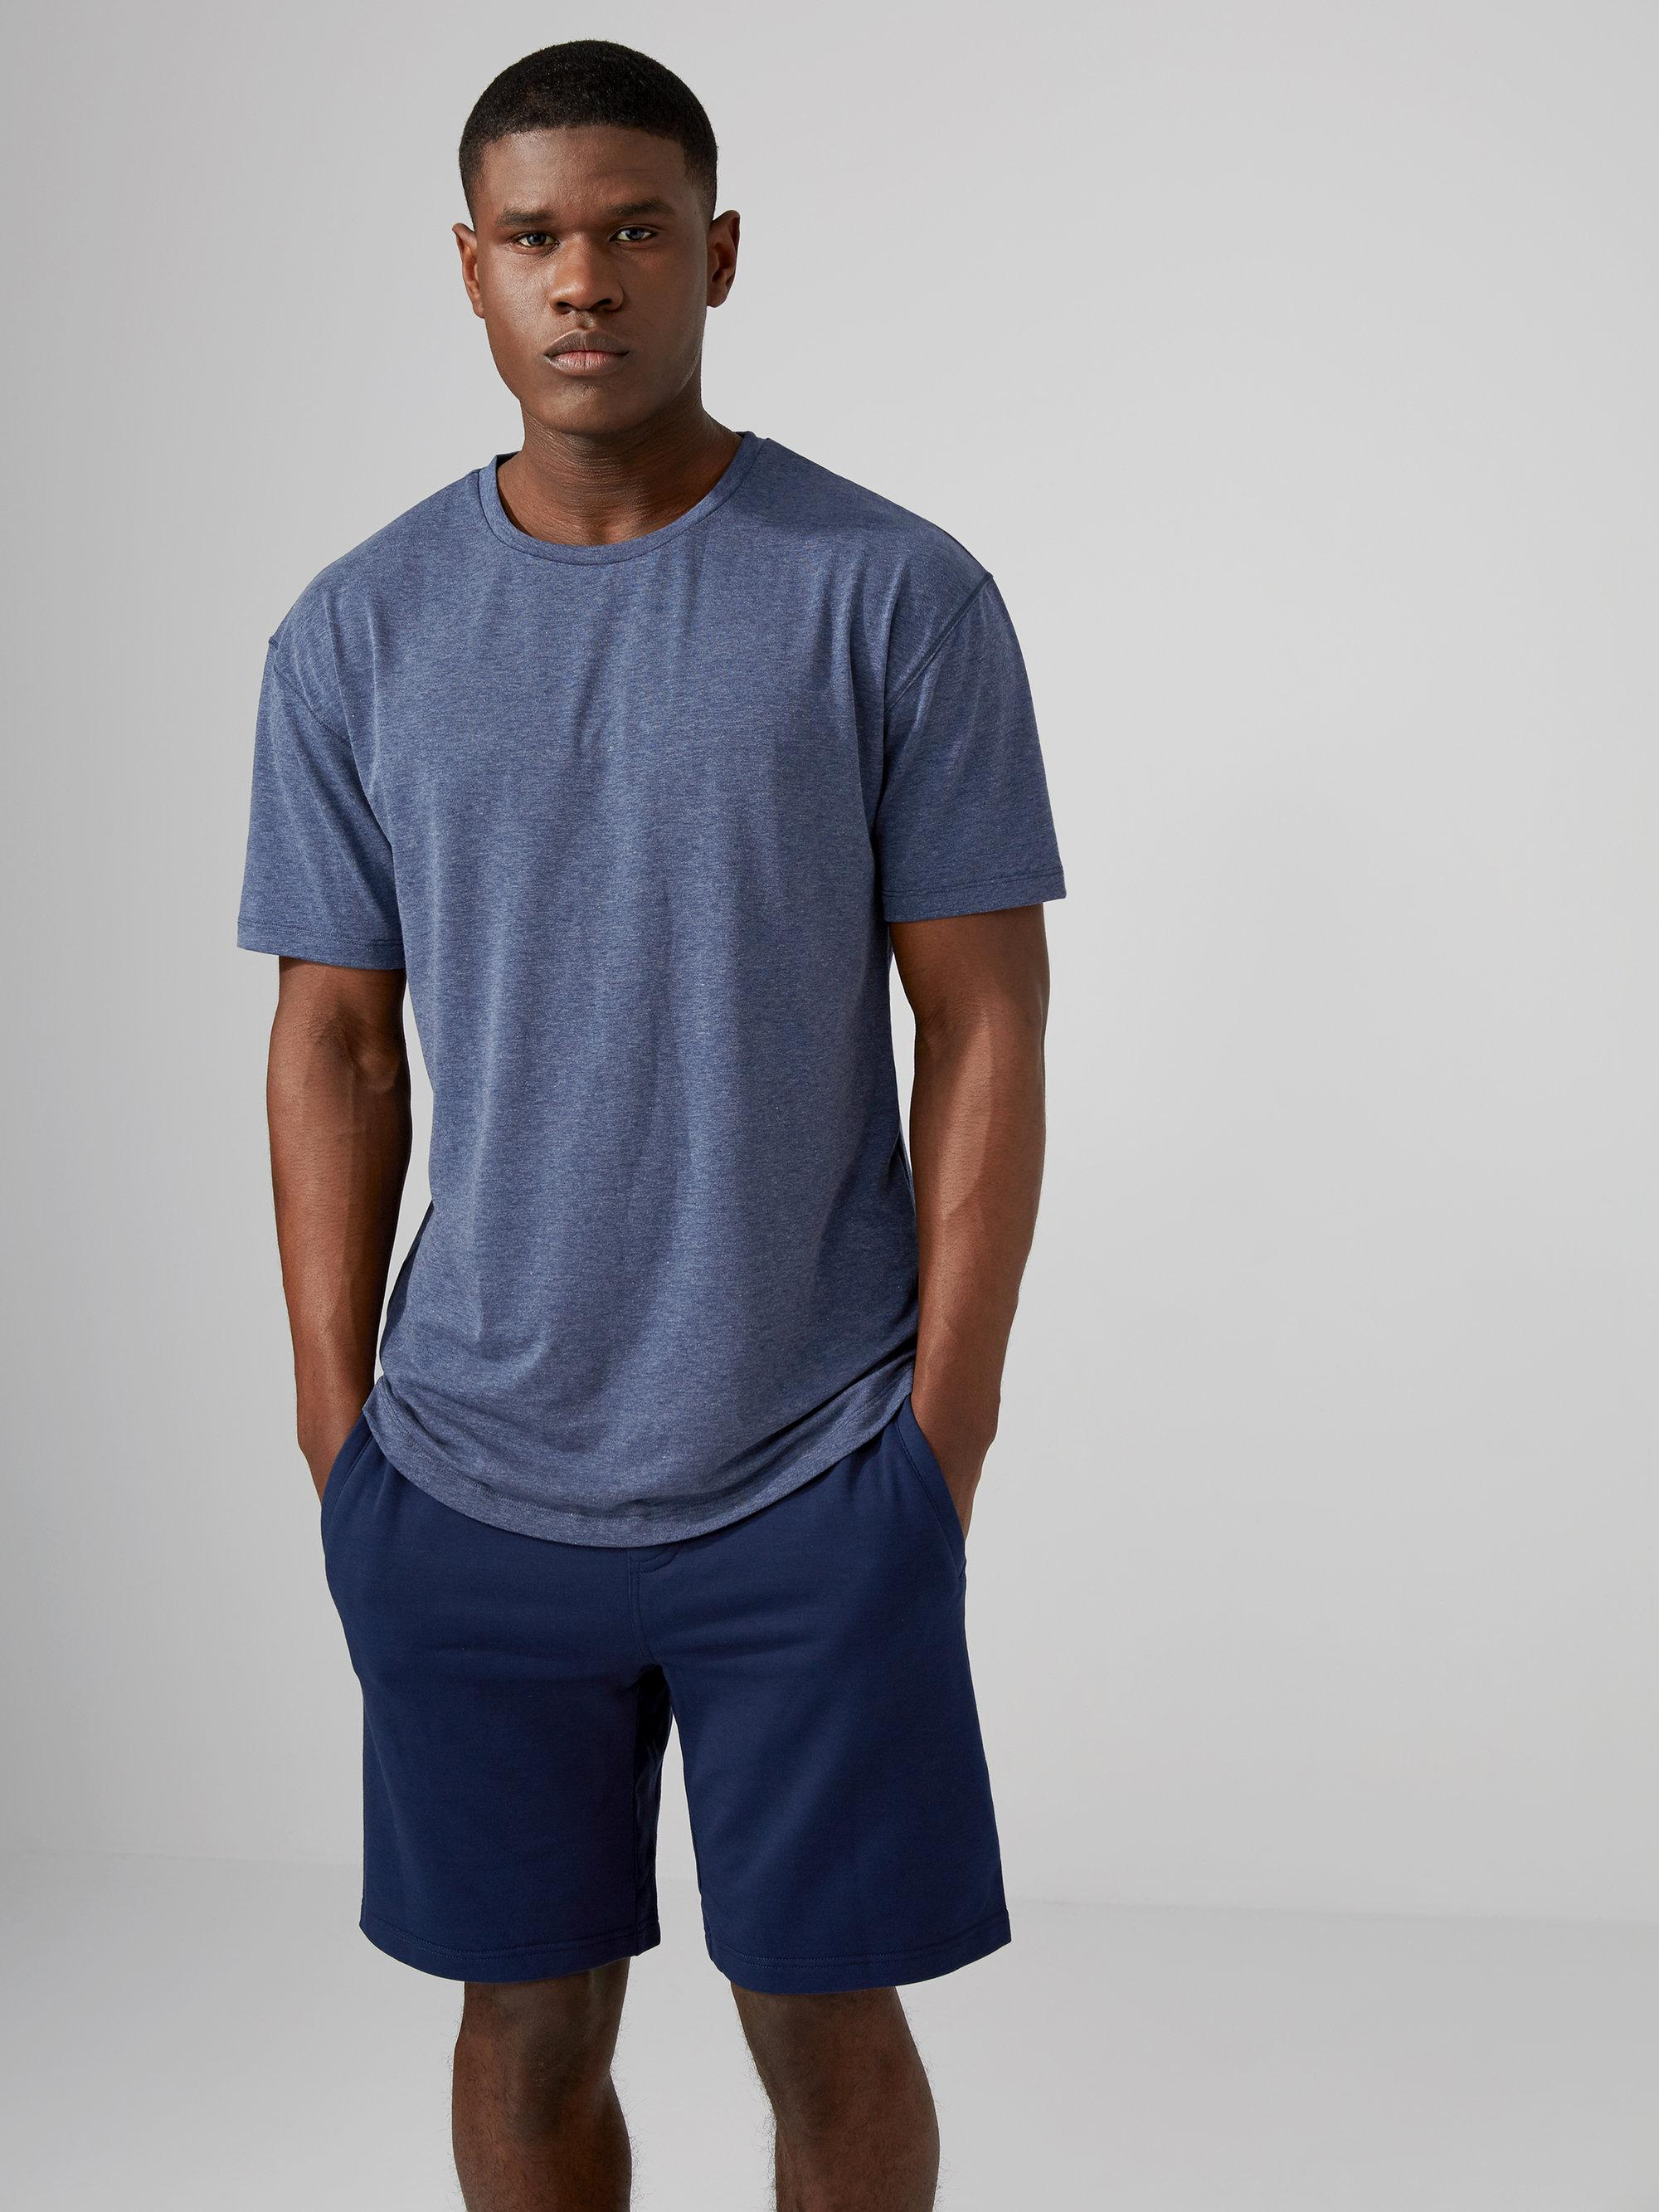 Frank oak frank oak sc drirelease loose fit t shirt for Frank and oak shirt